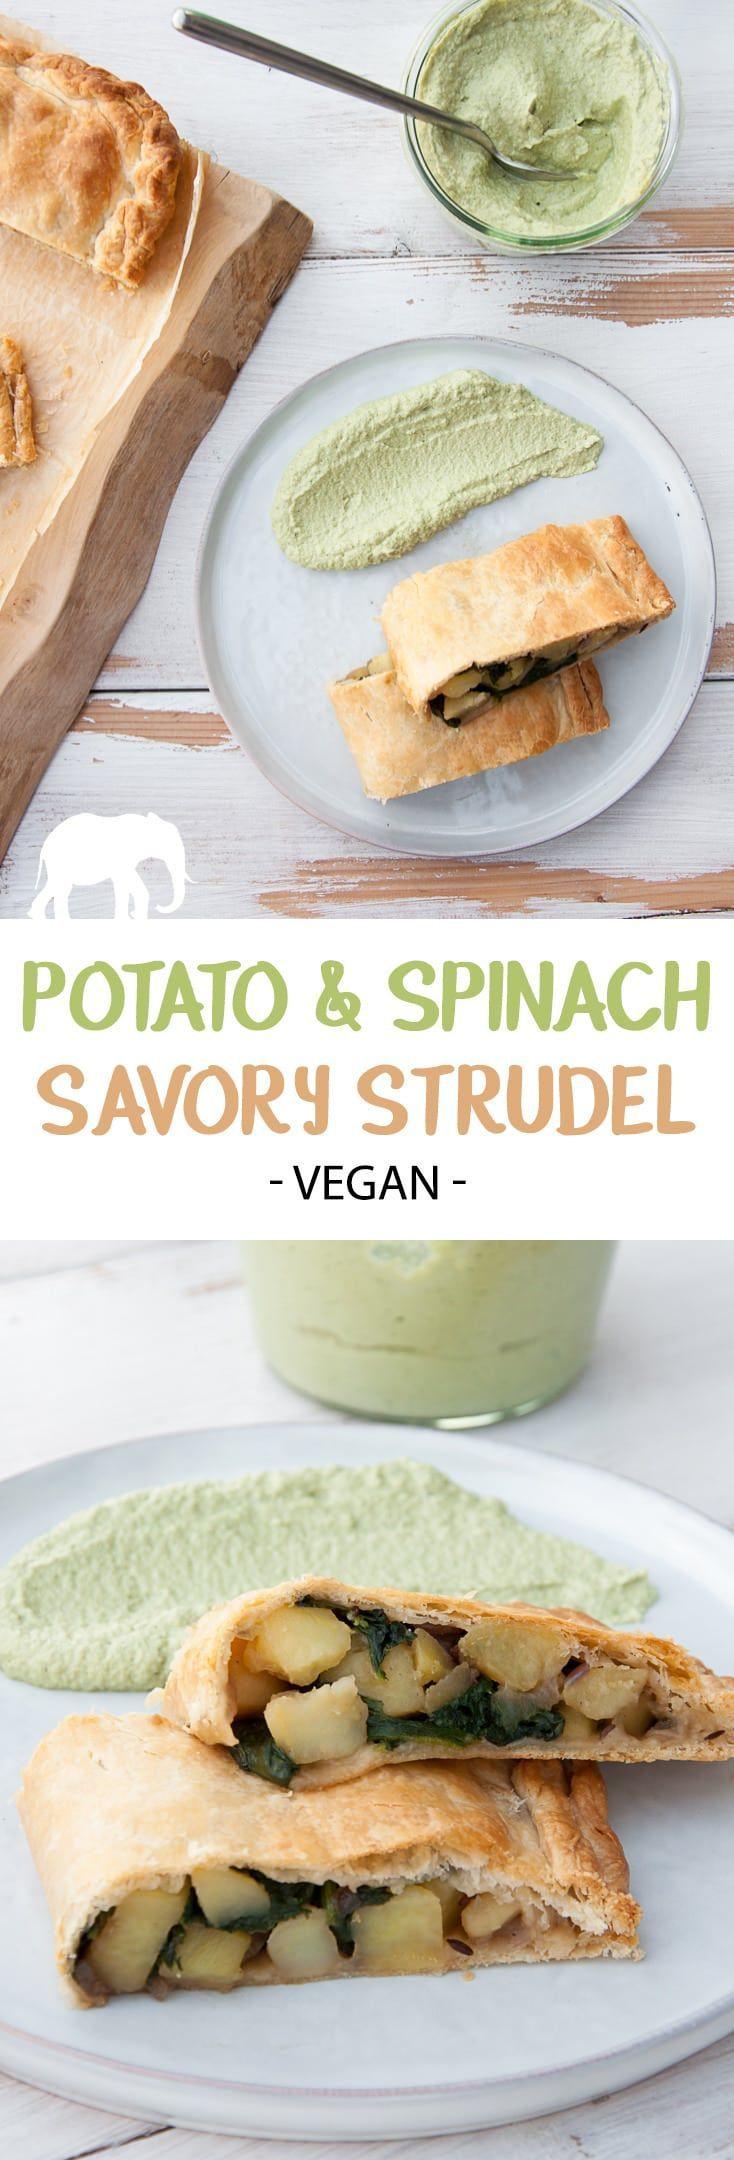 Potato & Spinach Savory Strudel #vegan #potato #spinach #strudel #savory via @elephantasticv